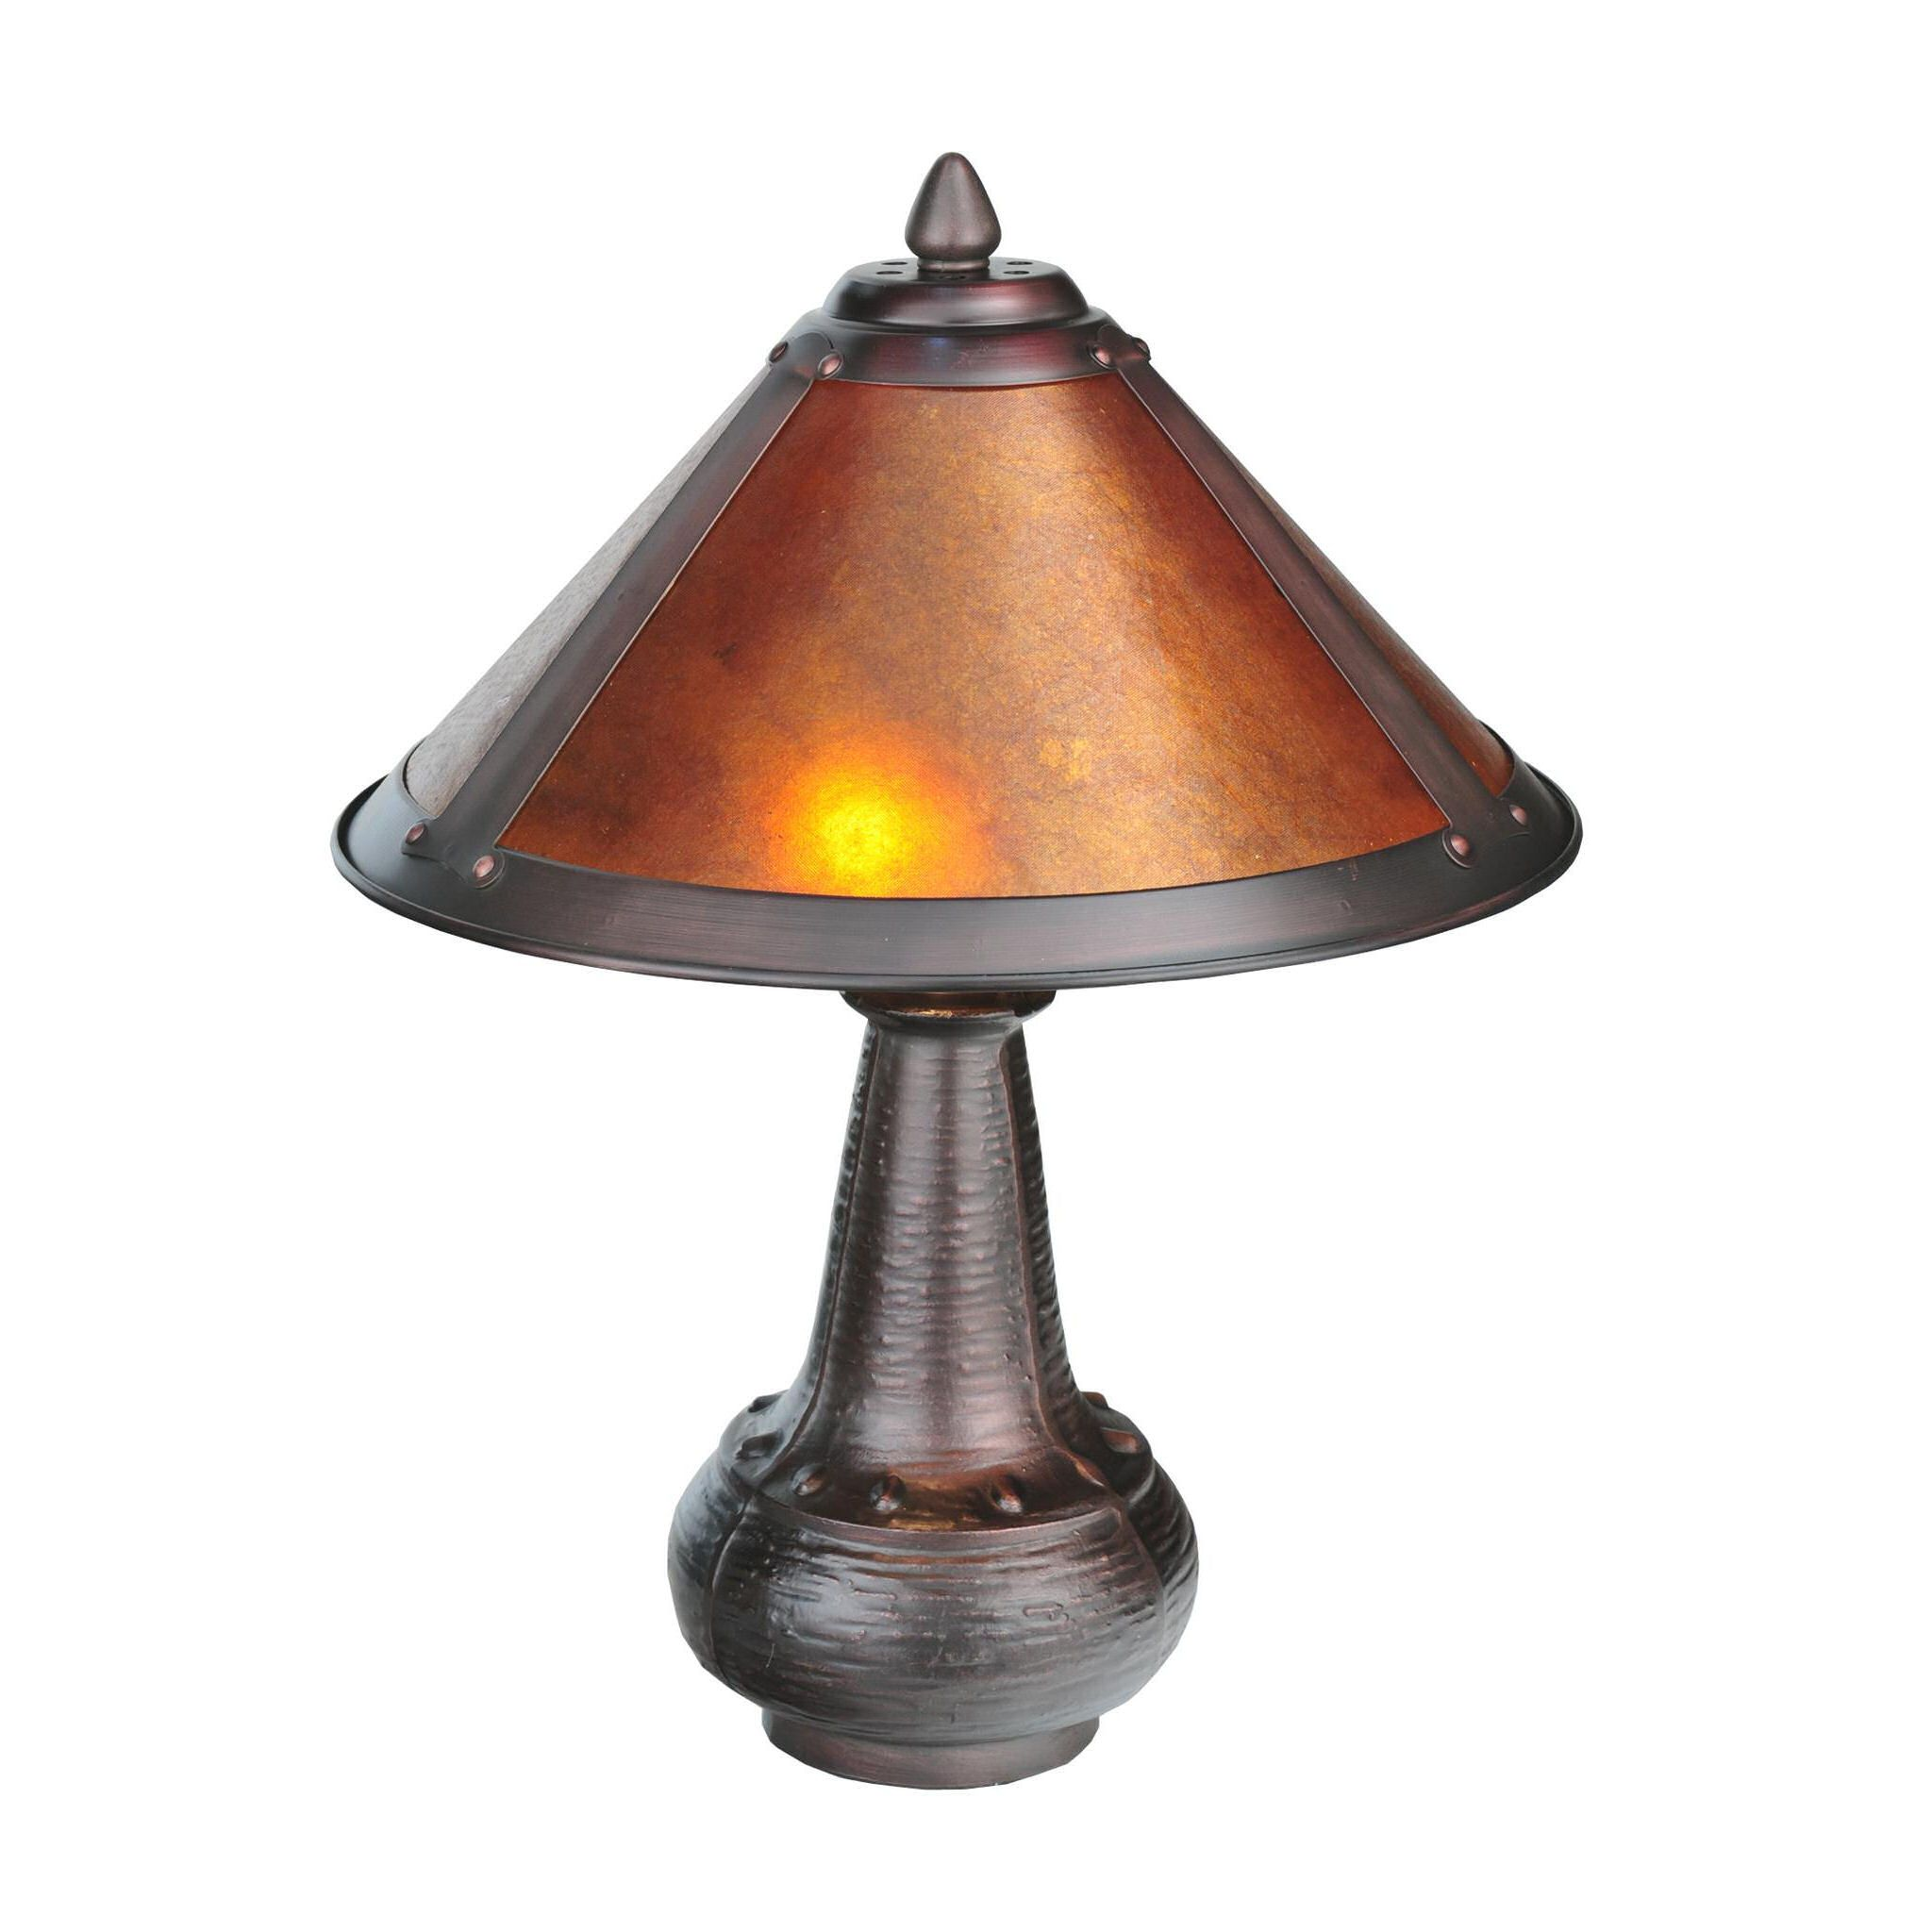 Gross Tiffany Tischlampen Rabatt Lampen Tiffany Lampen In Der Nahe Von Mir Mission Stil Tisch Lampen Braun T Lamp Tiffany Table Lamps Stained Glass Table Lamps